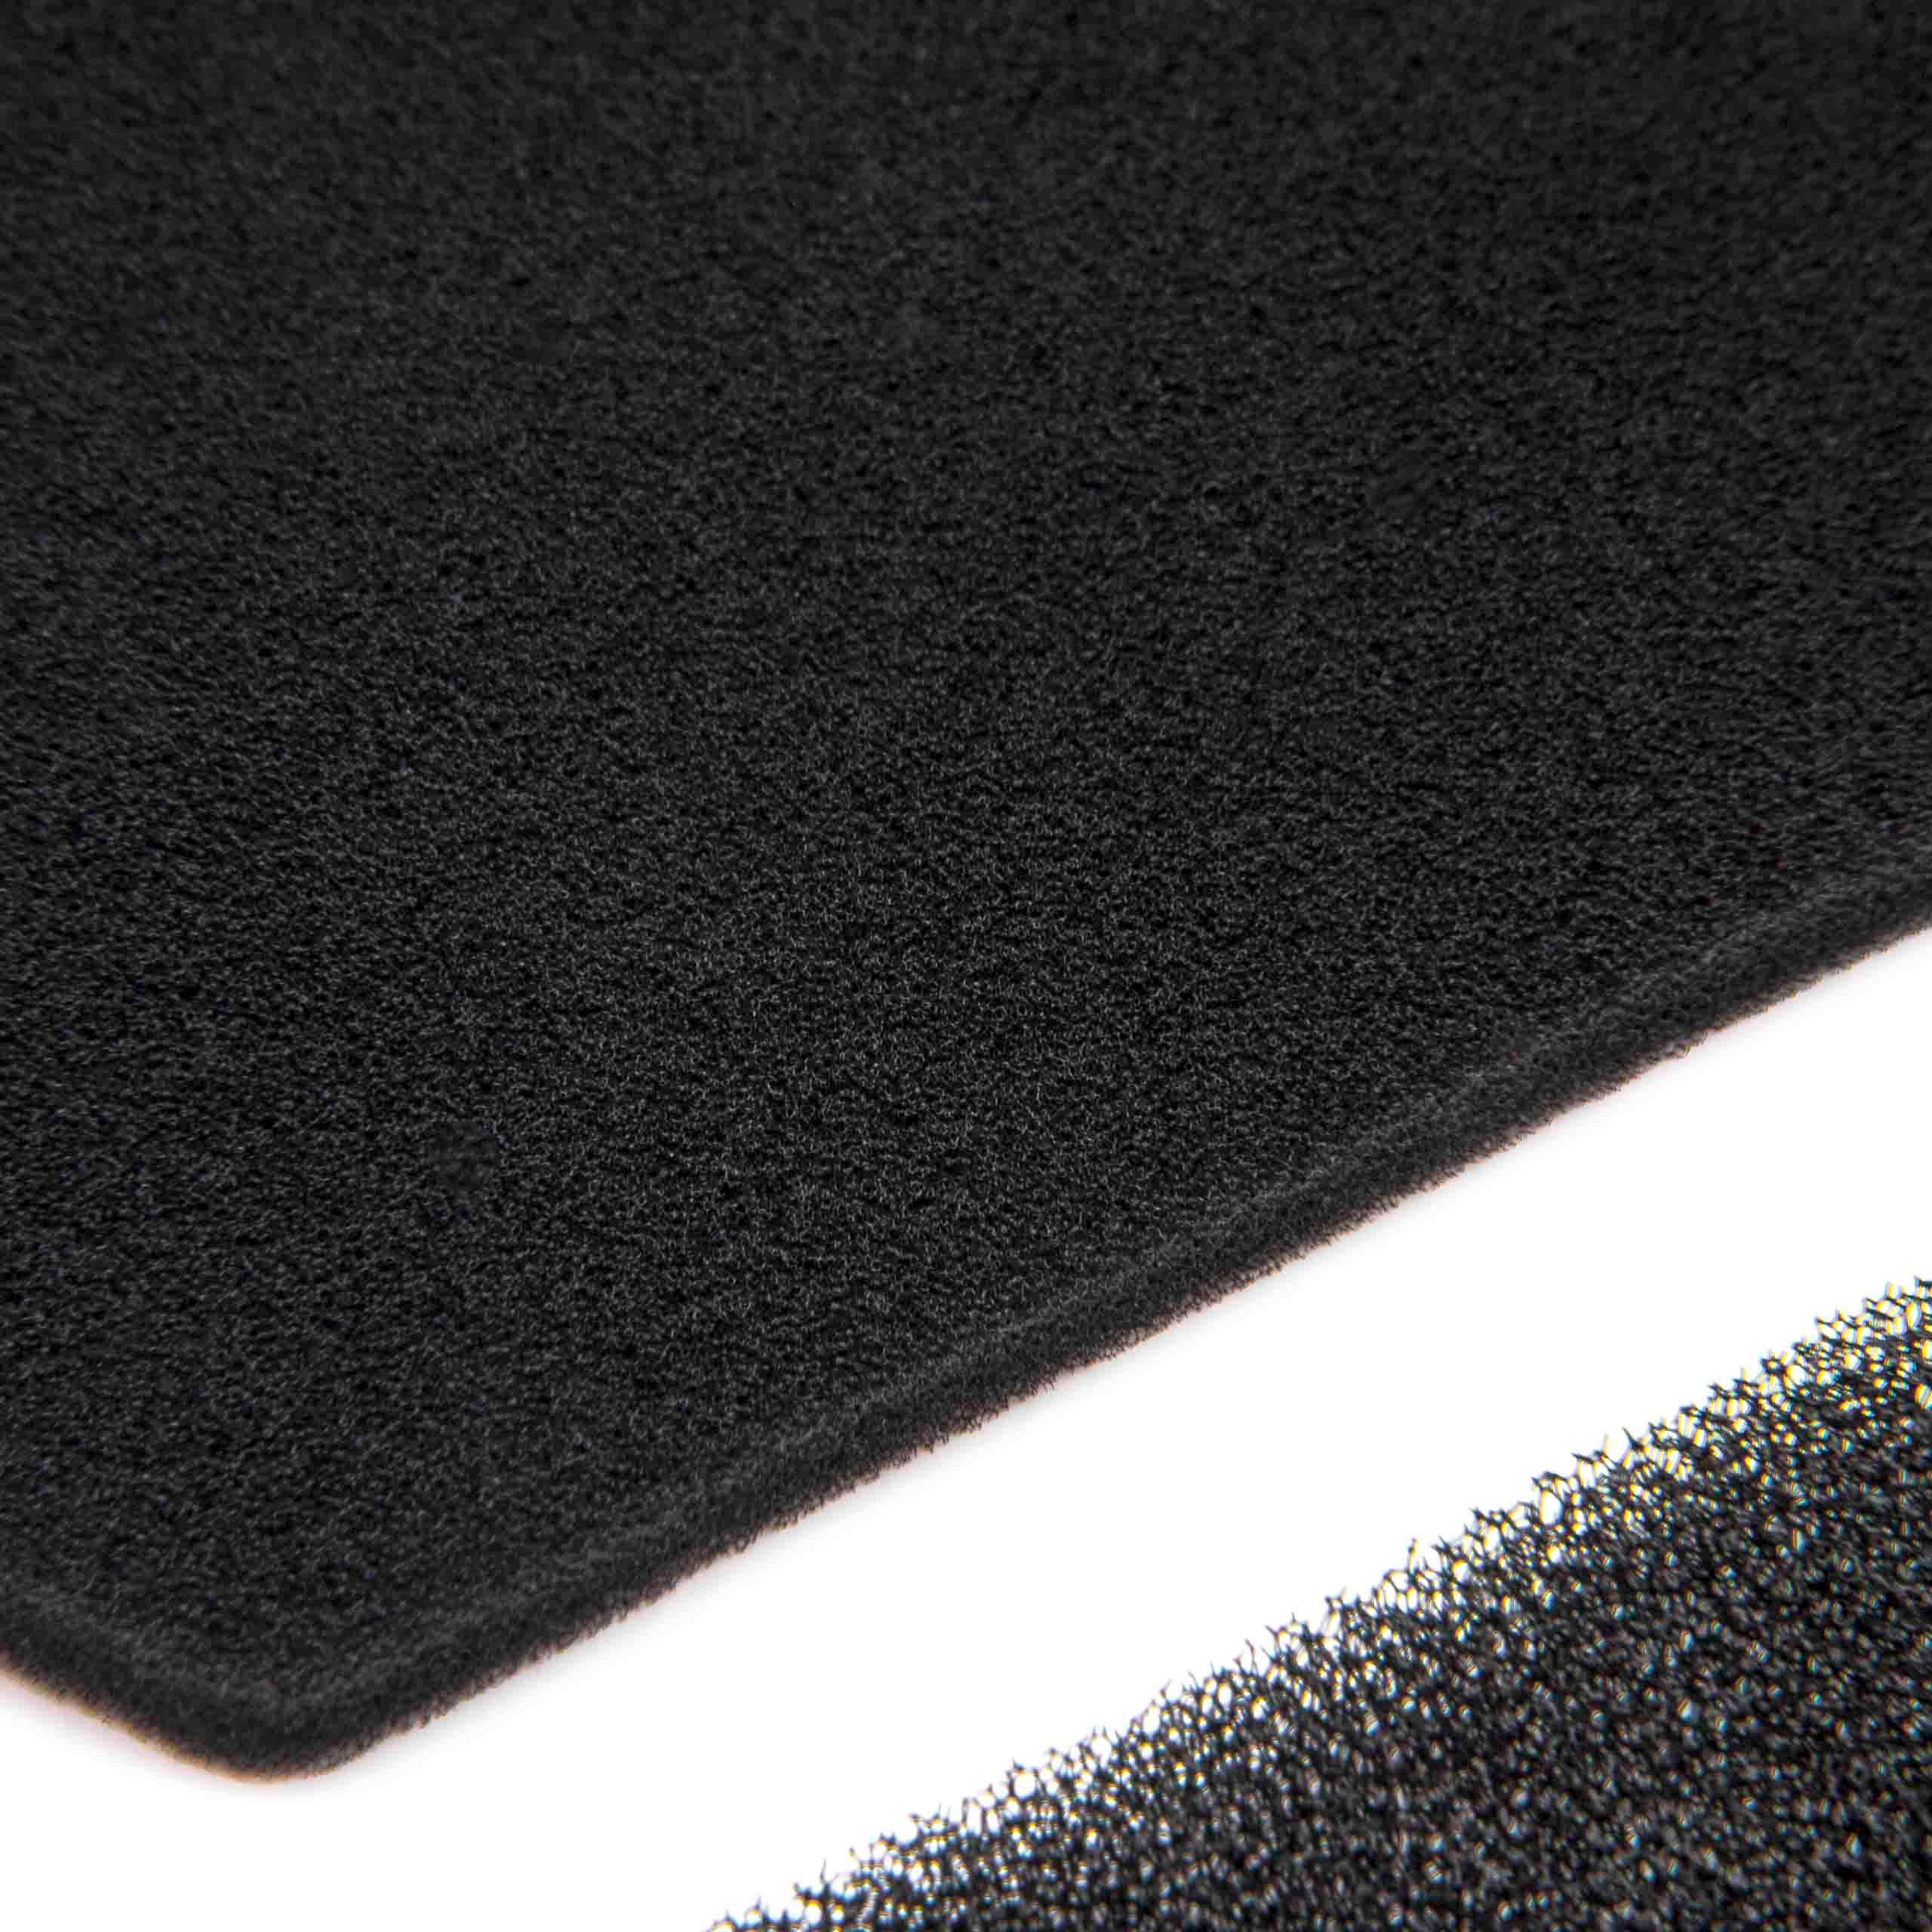 schaumfilter schwammfilter 2 1 f r miele t8000 t8626. Black Bedroom Furniture Sets. Home Design Ideas